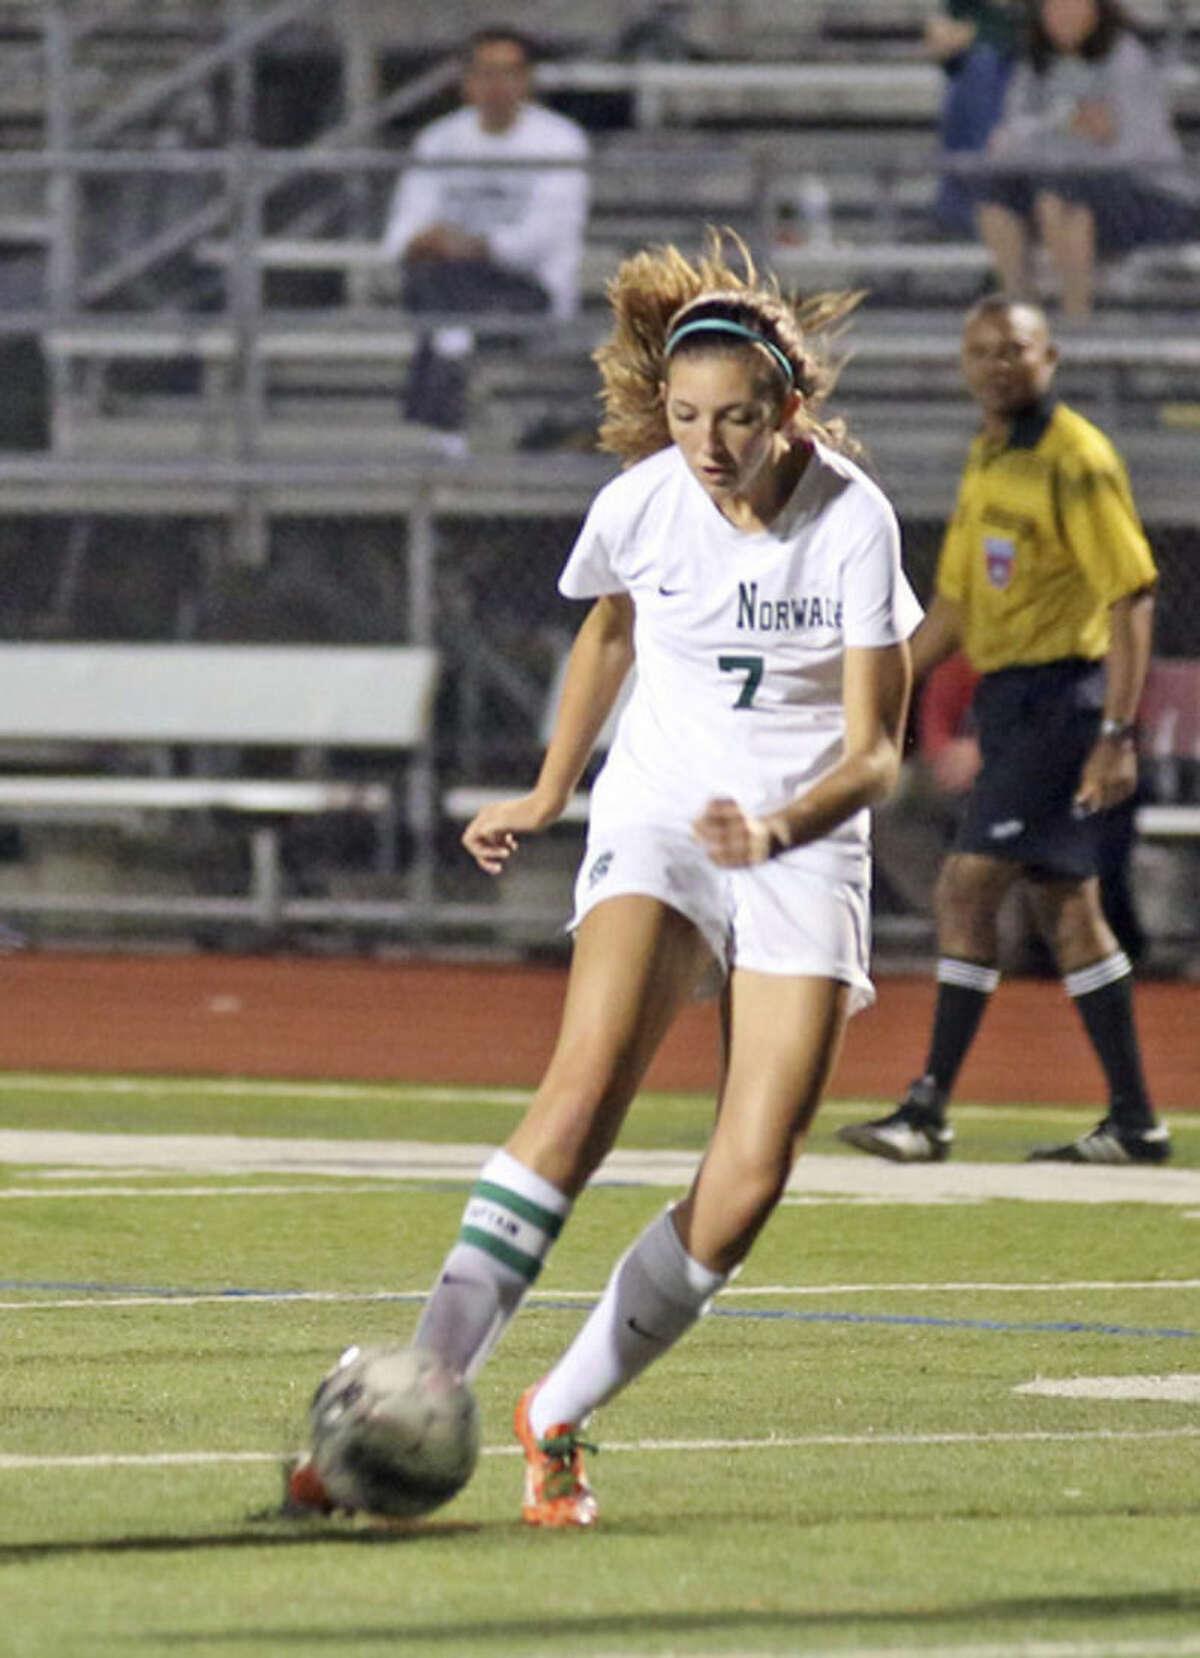 Hour Photo / Danielle Calloway Norwalk's Natalie LaBella, kicks the ball during Friday night's game against Trinity at Norwalk High School.